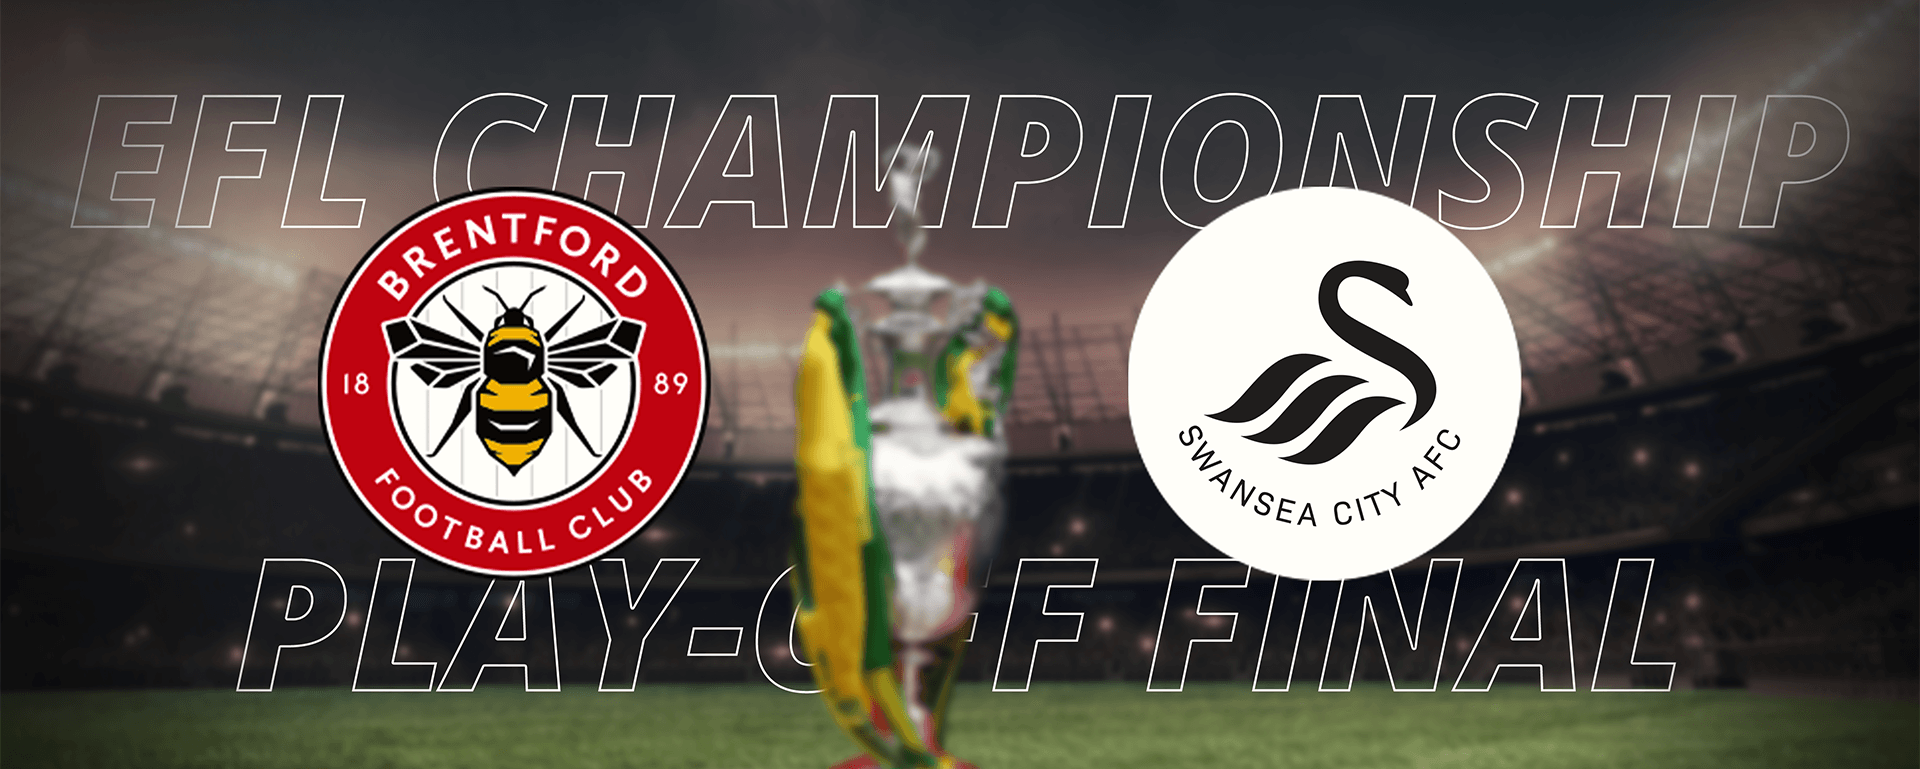 EFL CHAMPIONSHIP PLAY-OFF FINAL: BRENTFORD VS SWANSEA CITY